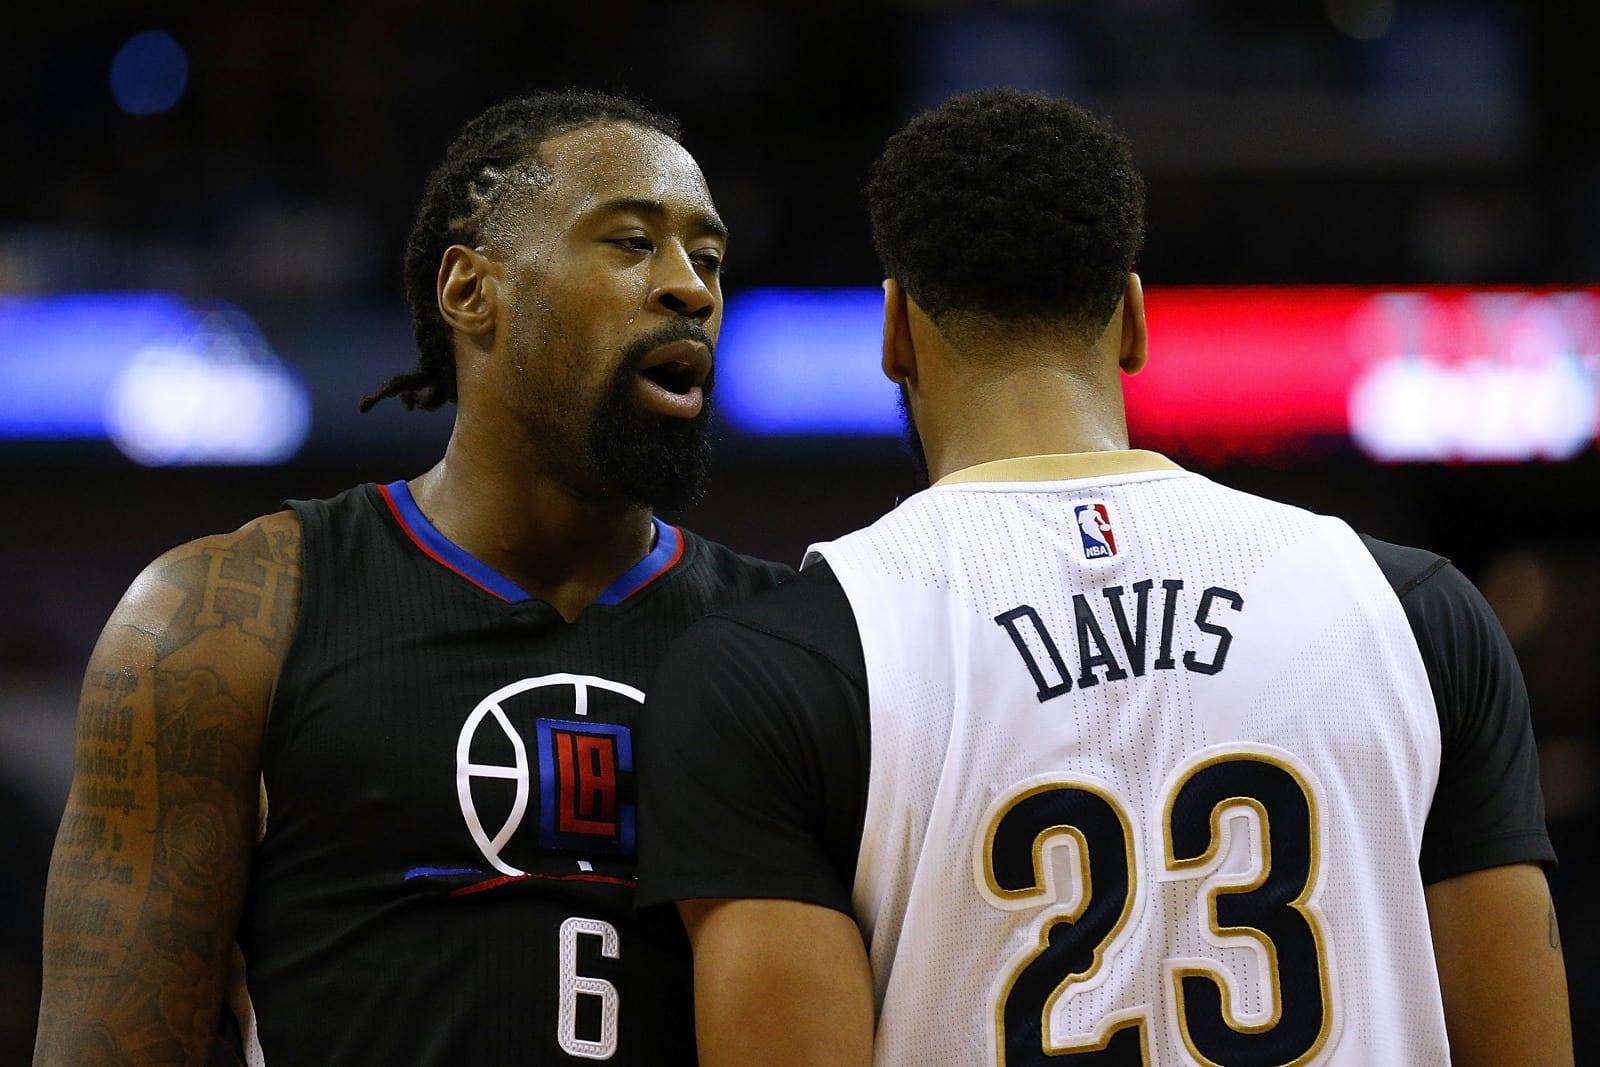 DeAndre Jordan, Los Angeles Clippers, Anthony Davis, New Orleans Pelicans